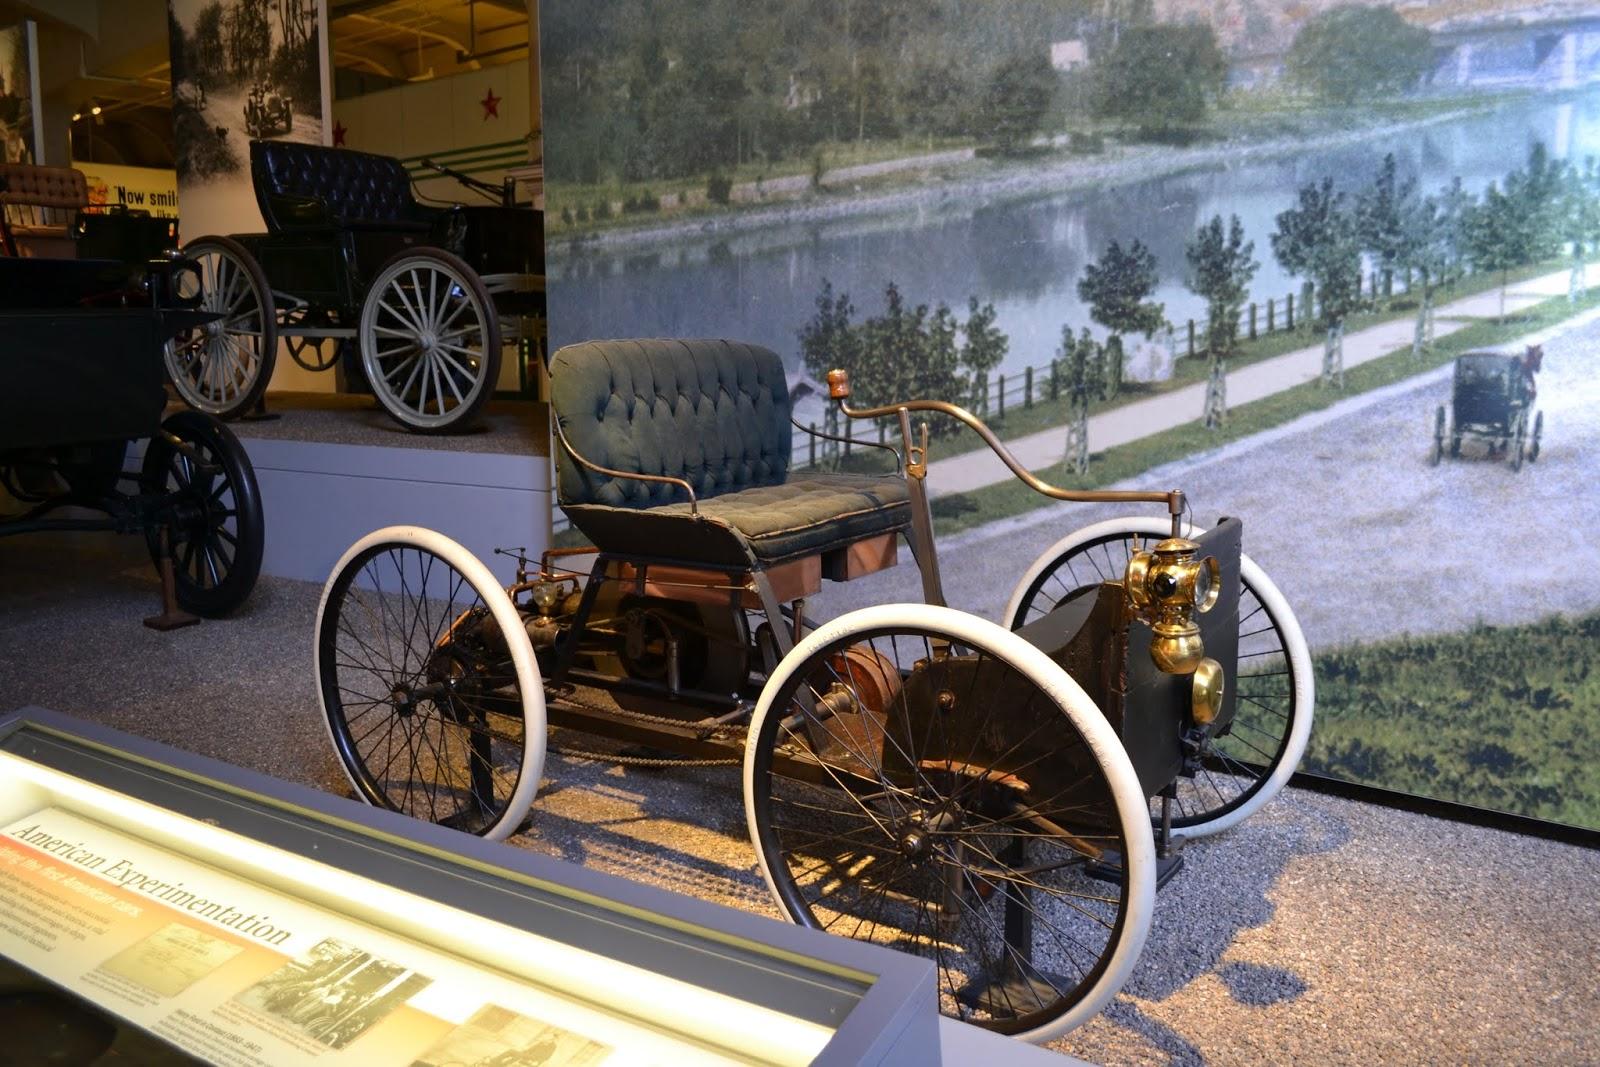 Ford Quadricycle 1896 года. Музей Генри Форда. Дирборн, Мичиган (Henry Ford Museum, Dearborn, MI)